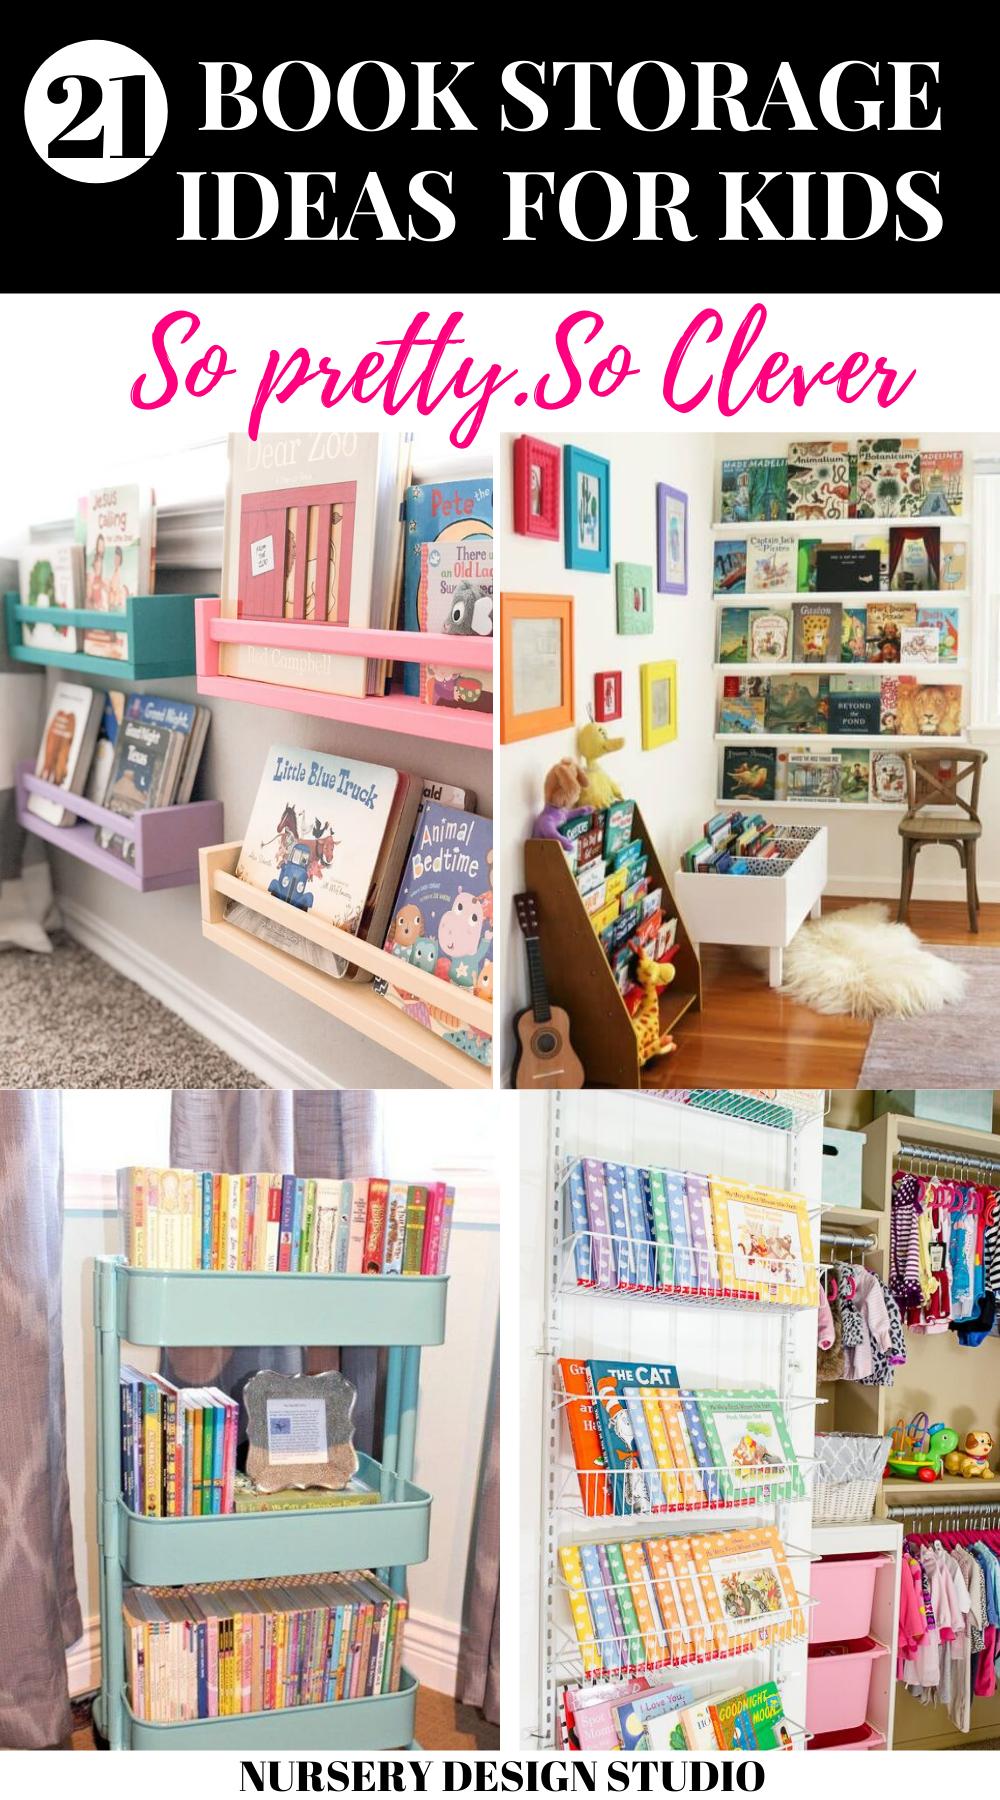 10 Cool And Creative Kids Book Storage Ideas Kids Book Storage Book Storage Kids Storage